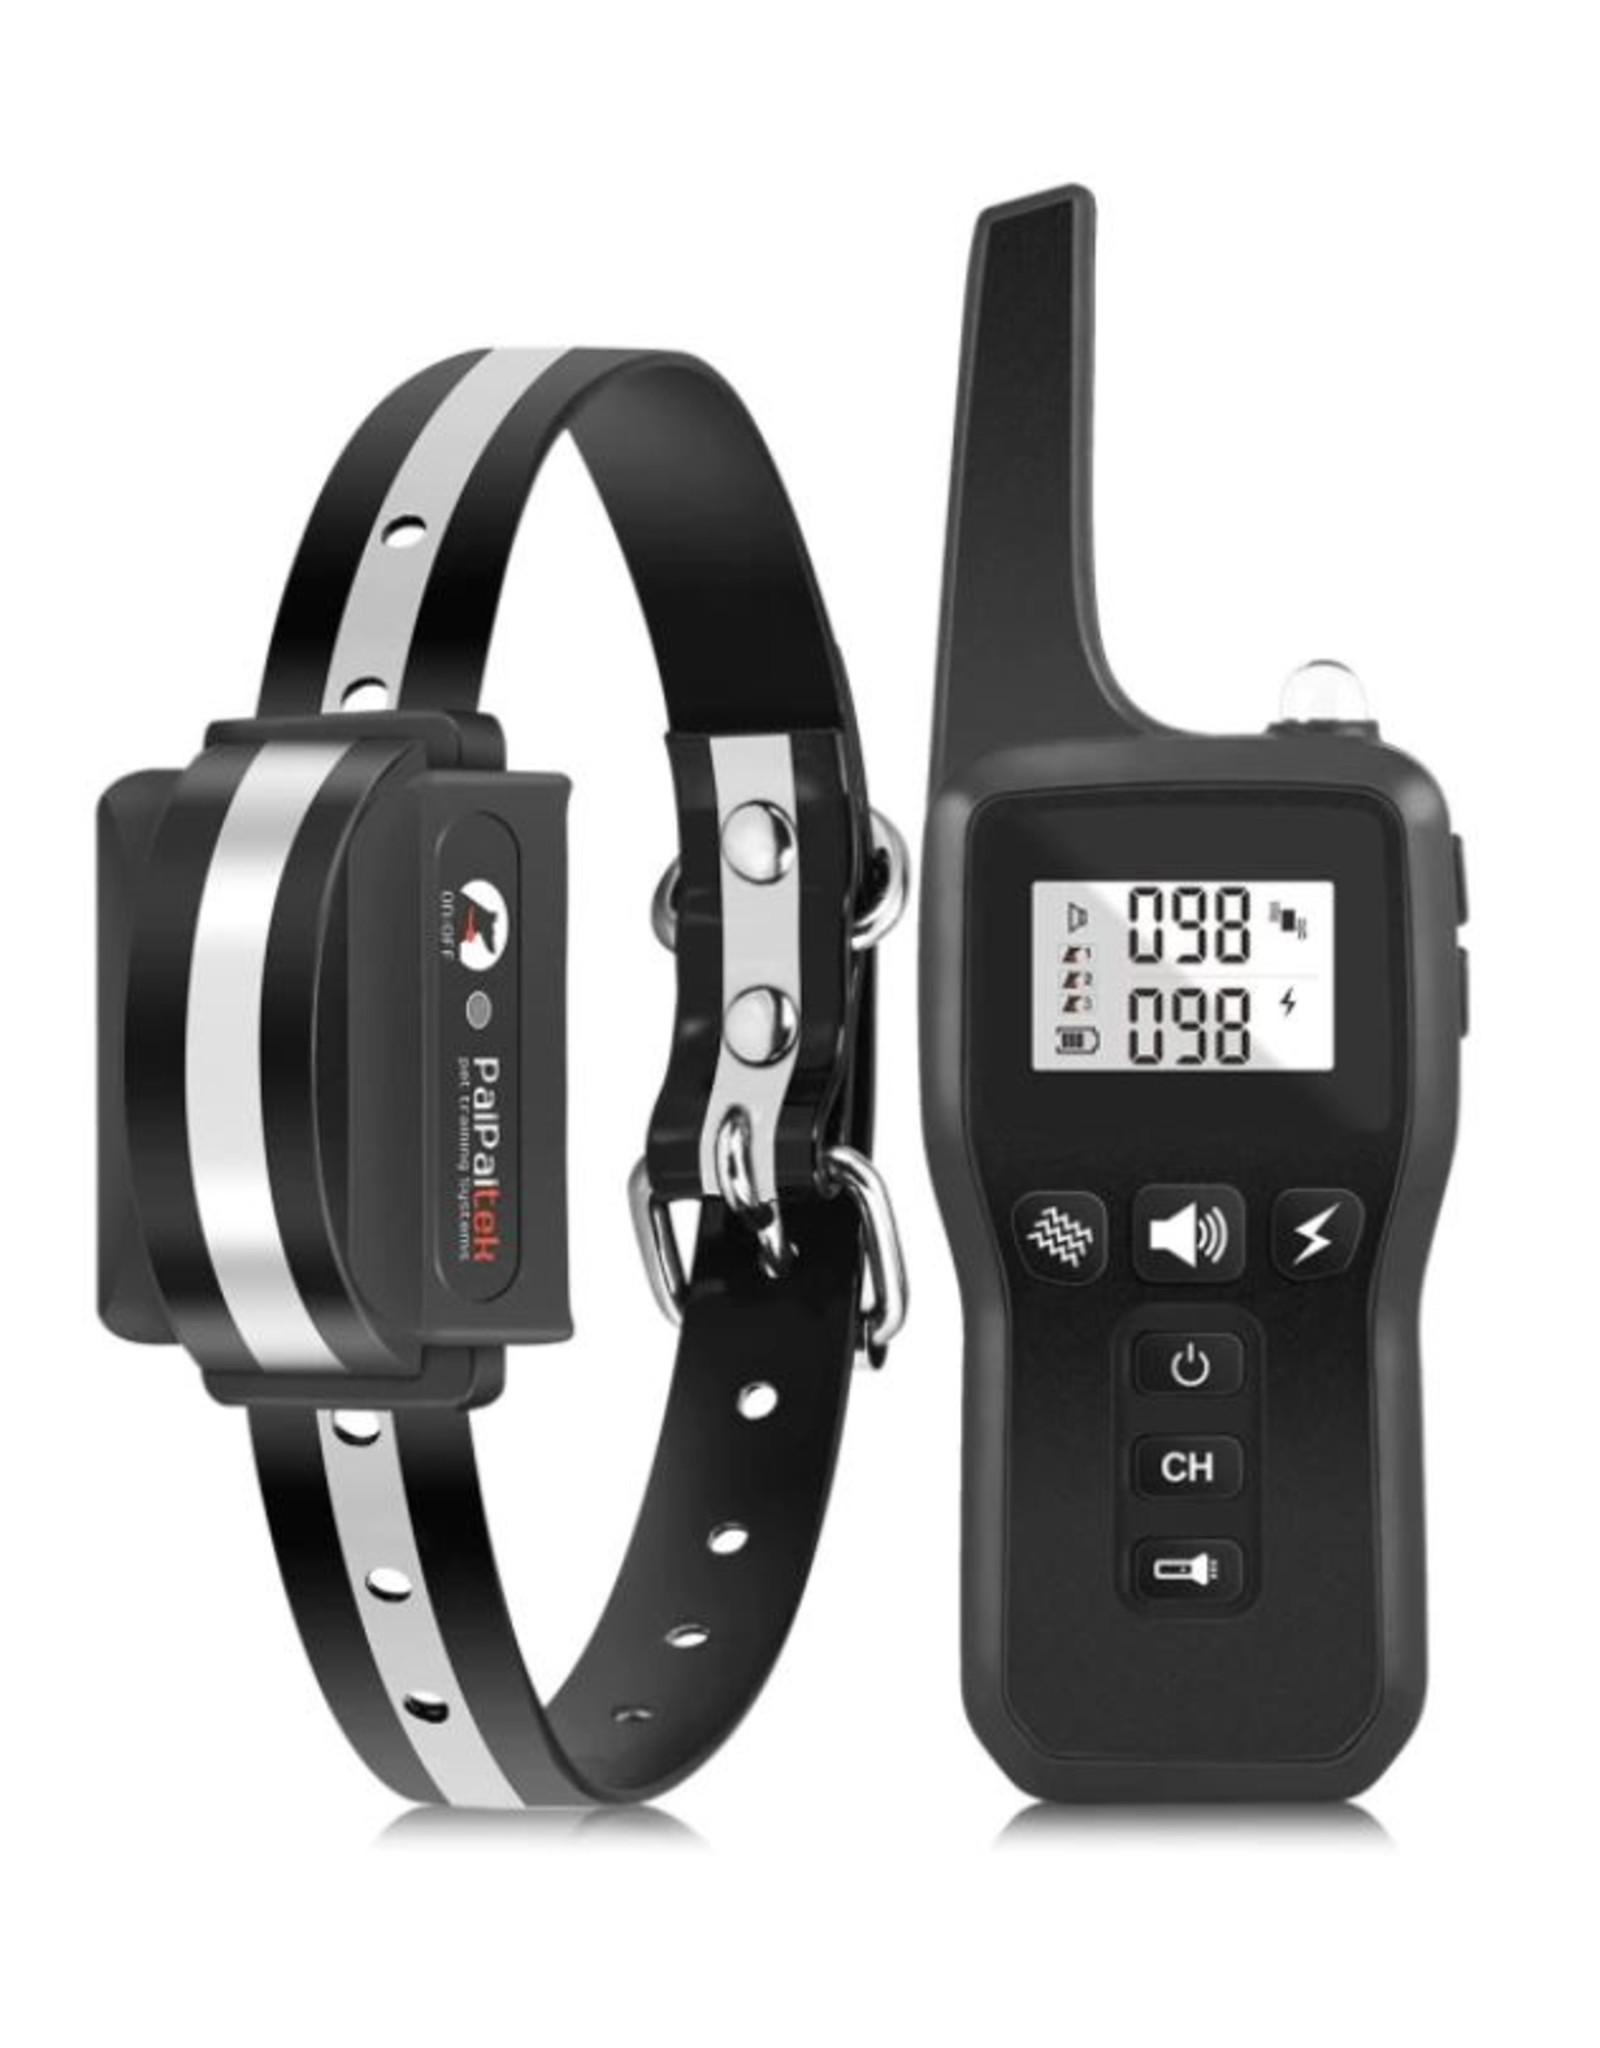 PD529 Elektrische hondentraining halsband 1000m - huisdier afstandsbediening - anti blafschok voor hond - 3 modus met oplaadbare waterdichte ontvanger